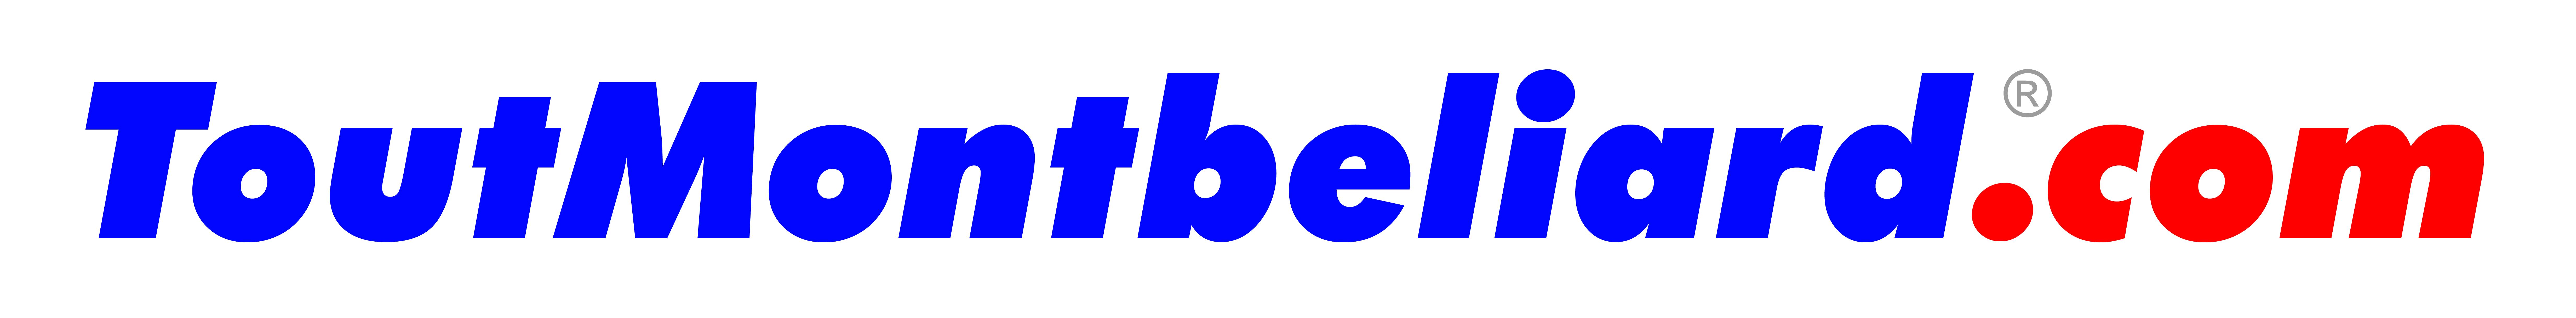 ToutMontbeliard-logo-long